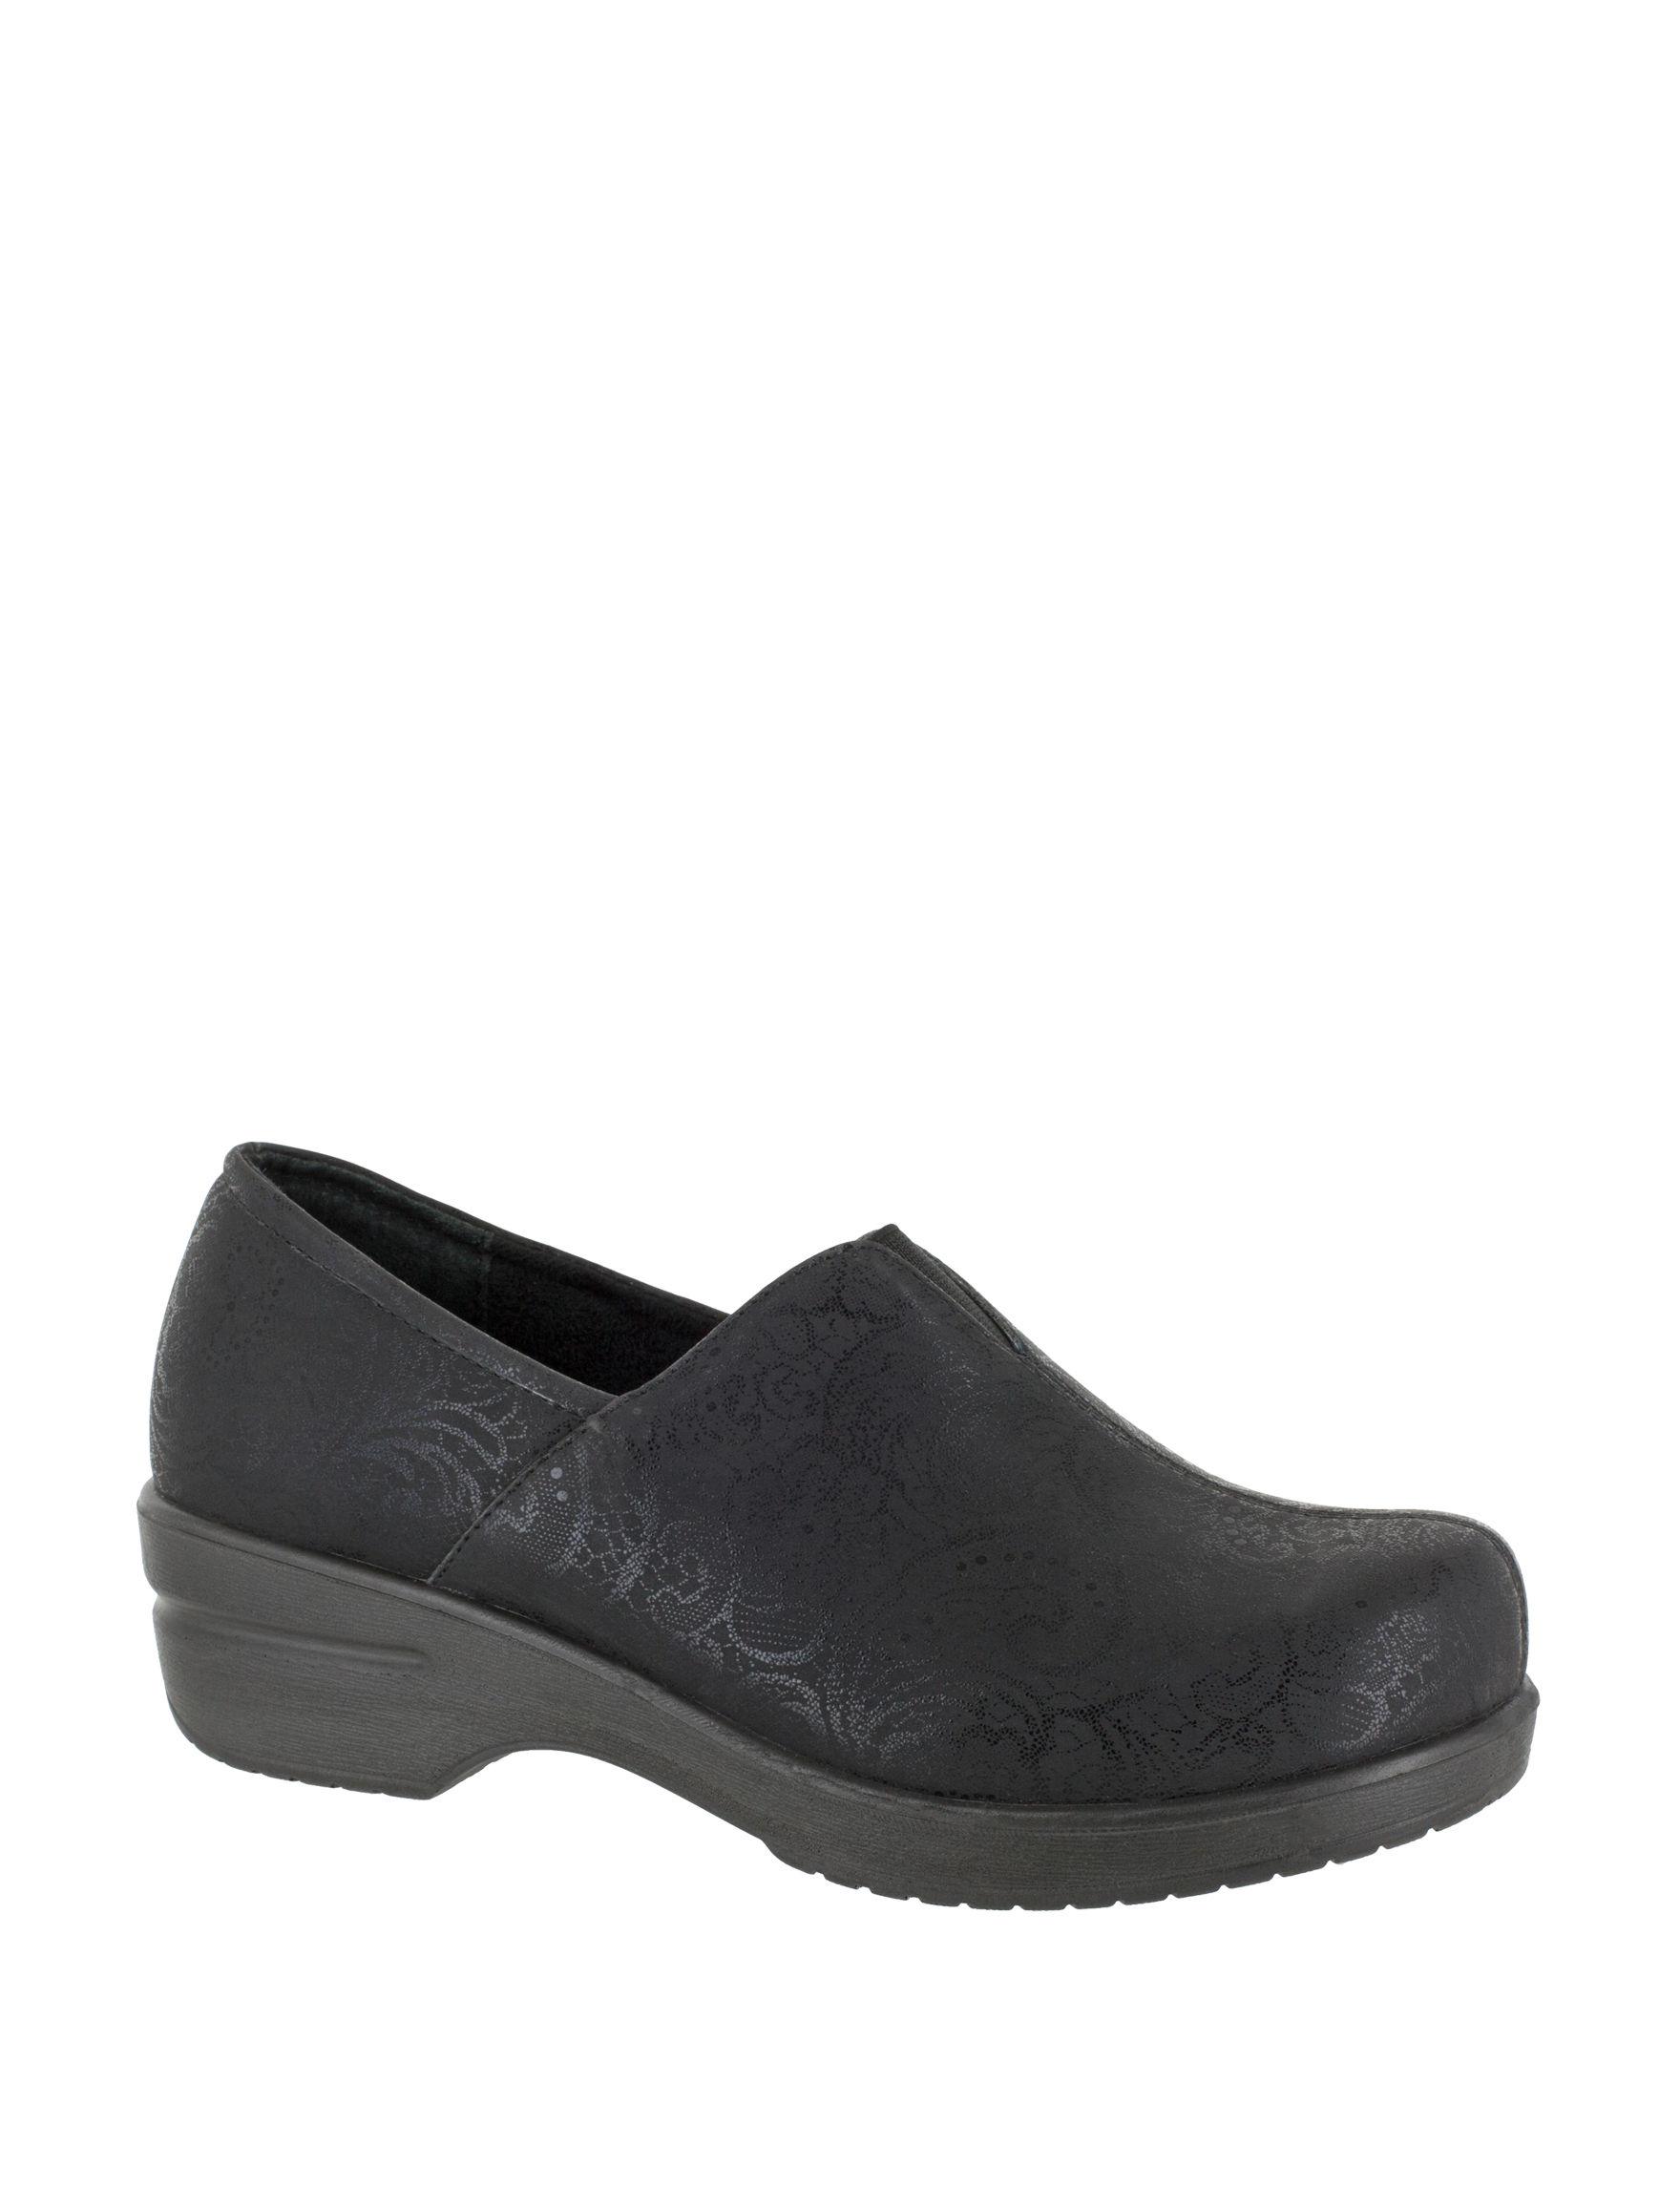 Easy Street Black Clogs Comfort